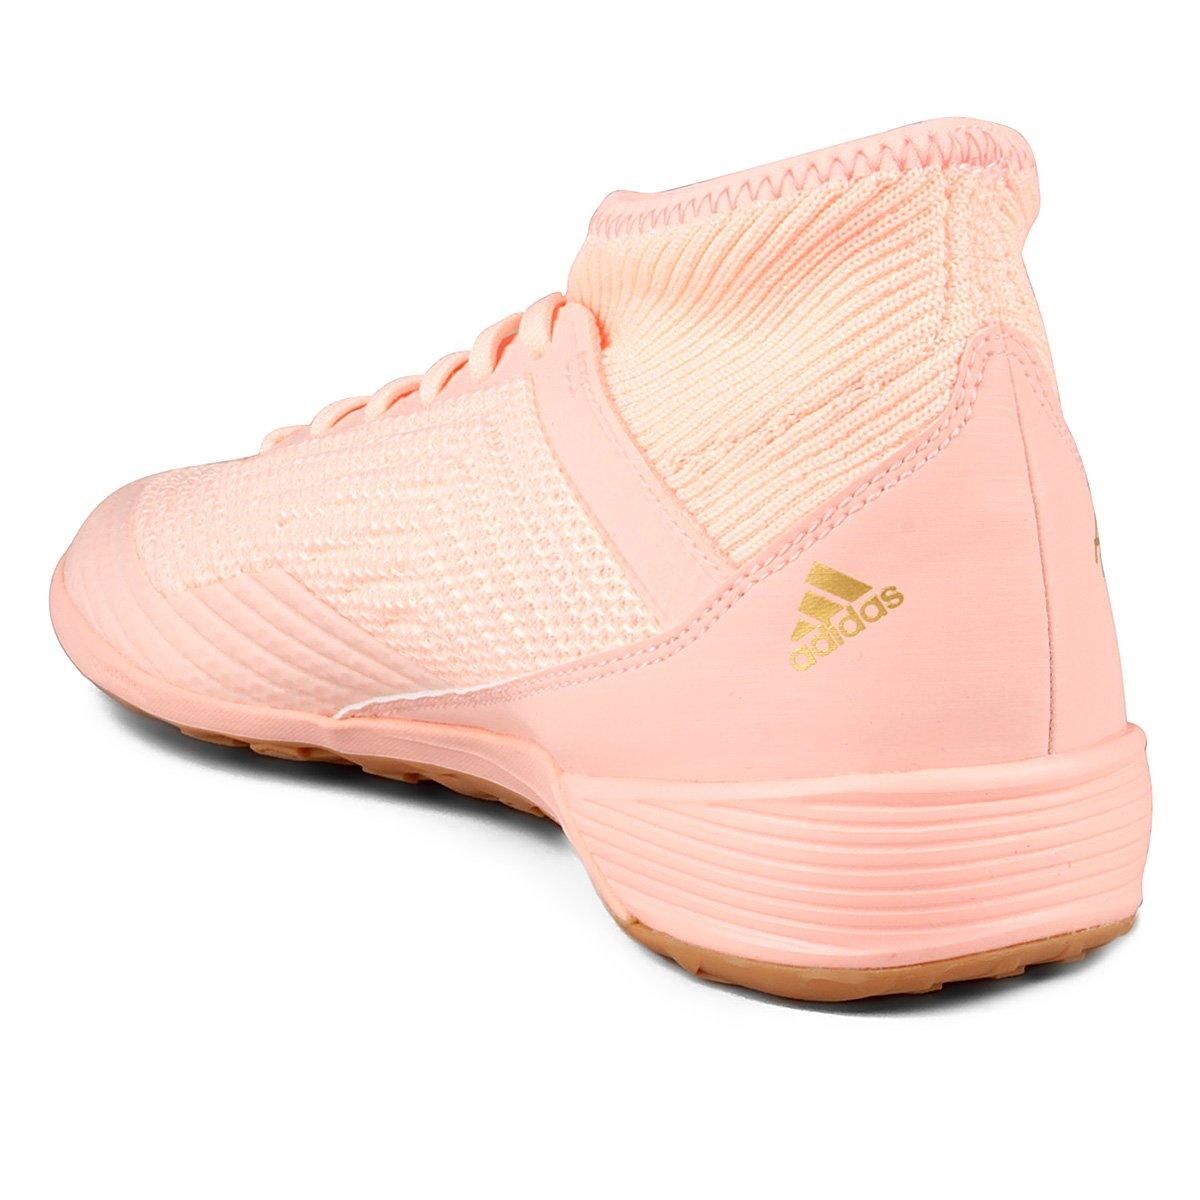 adidas rosa chuteira